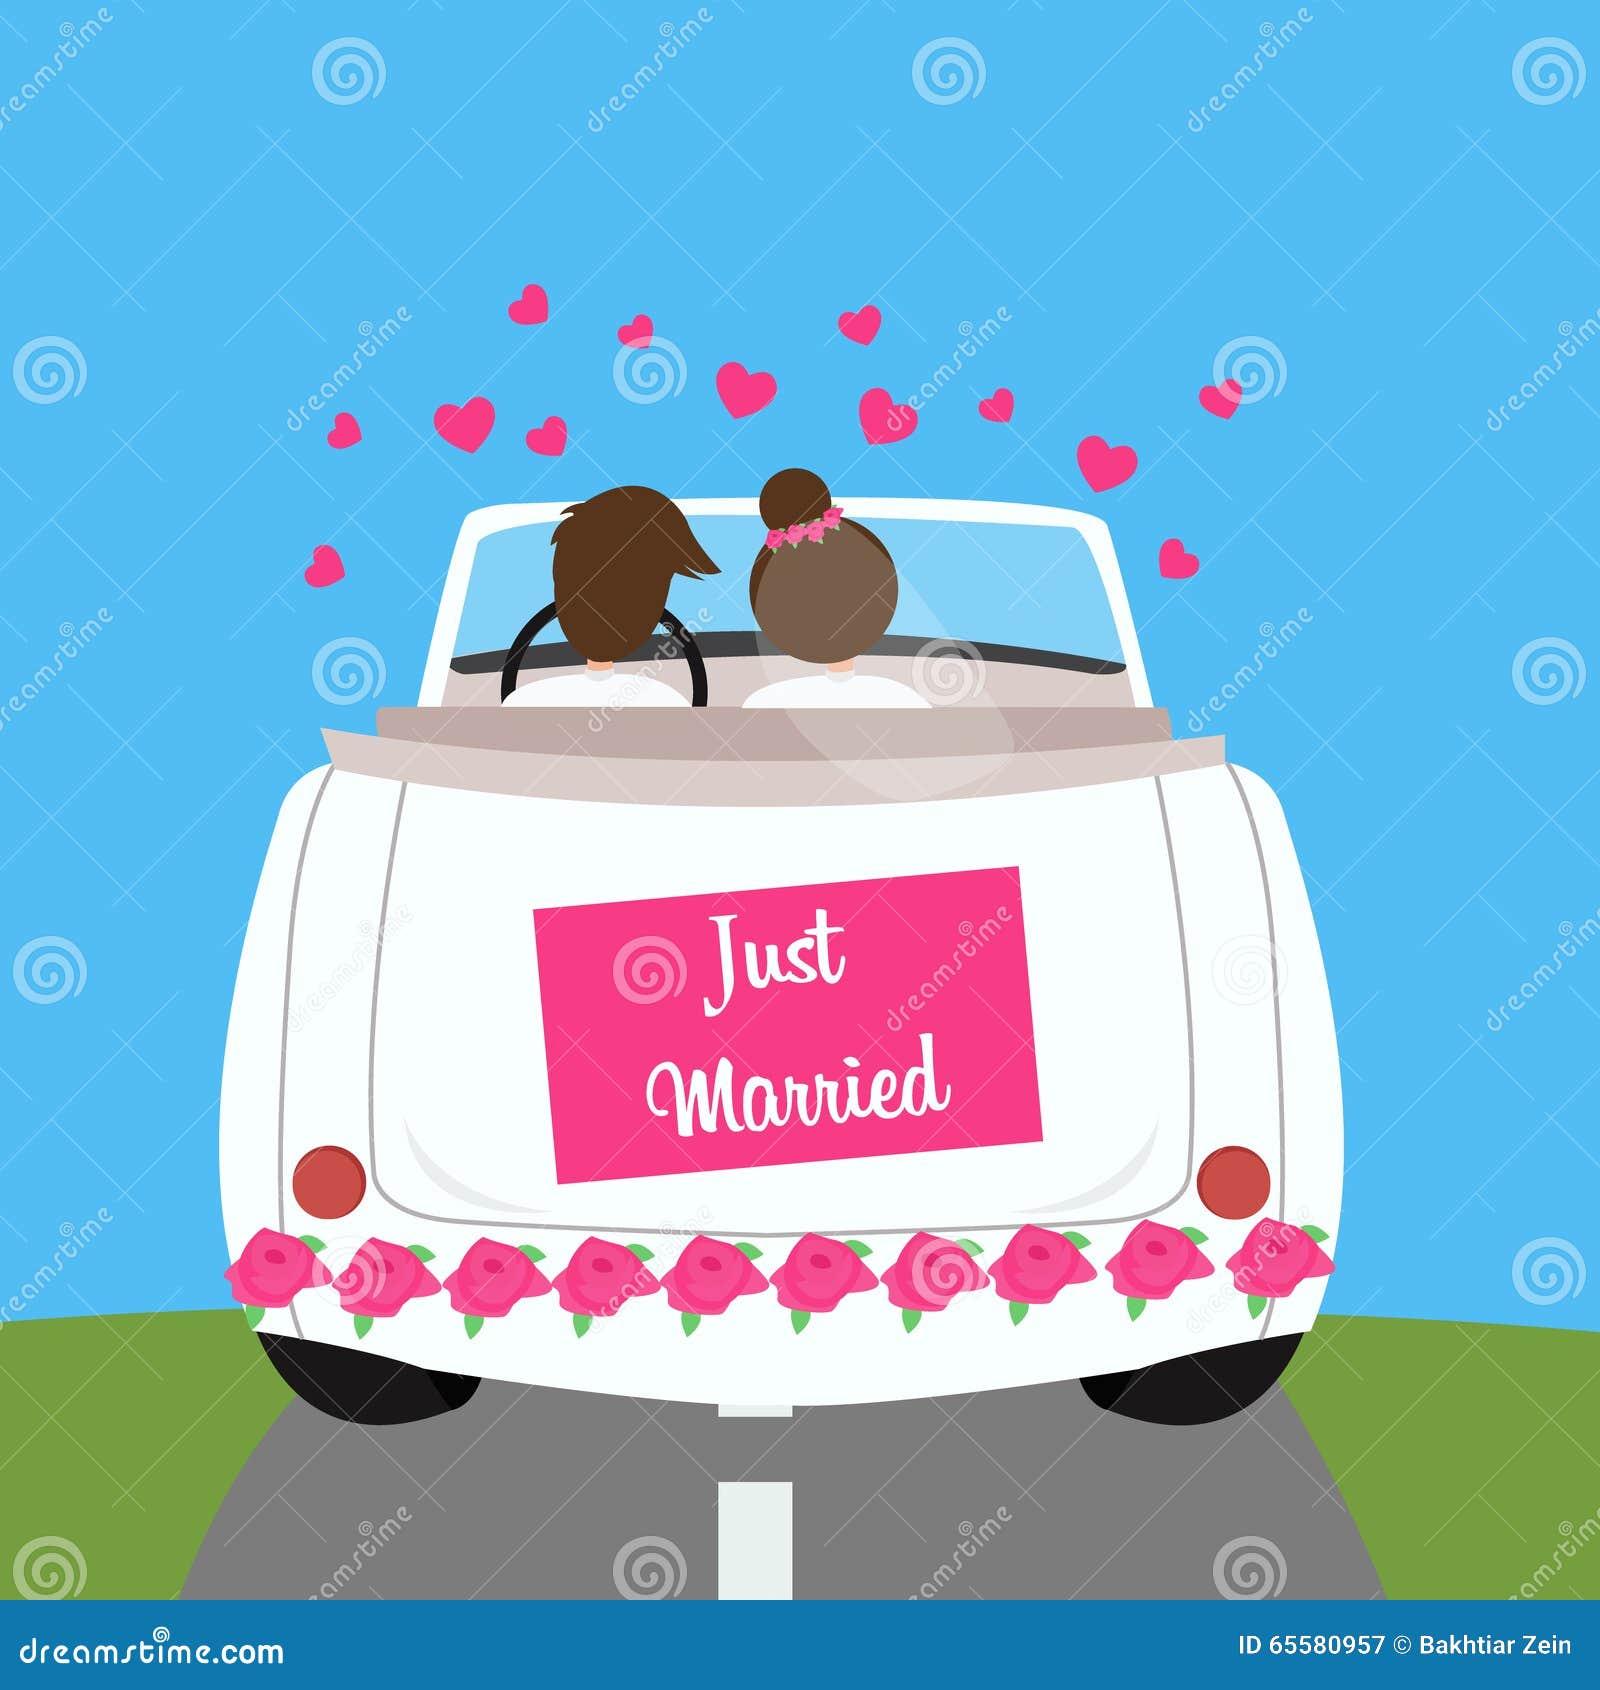 Just married wedding car couple honeymoon marriage